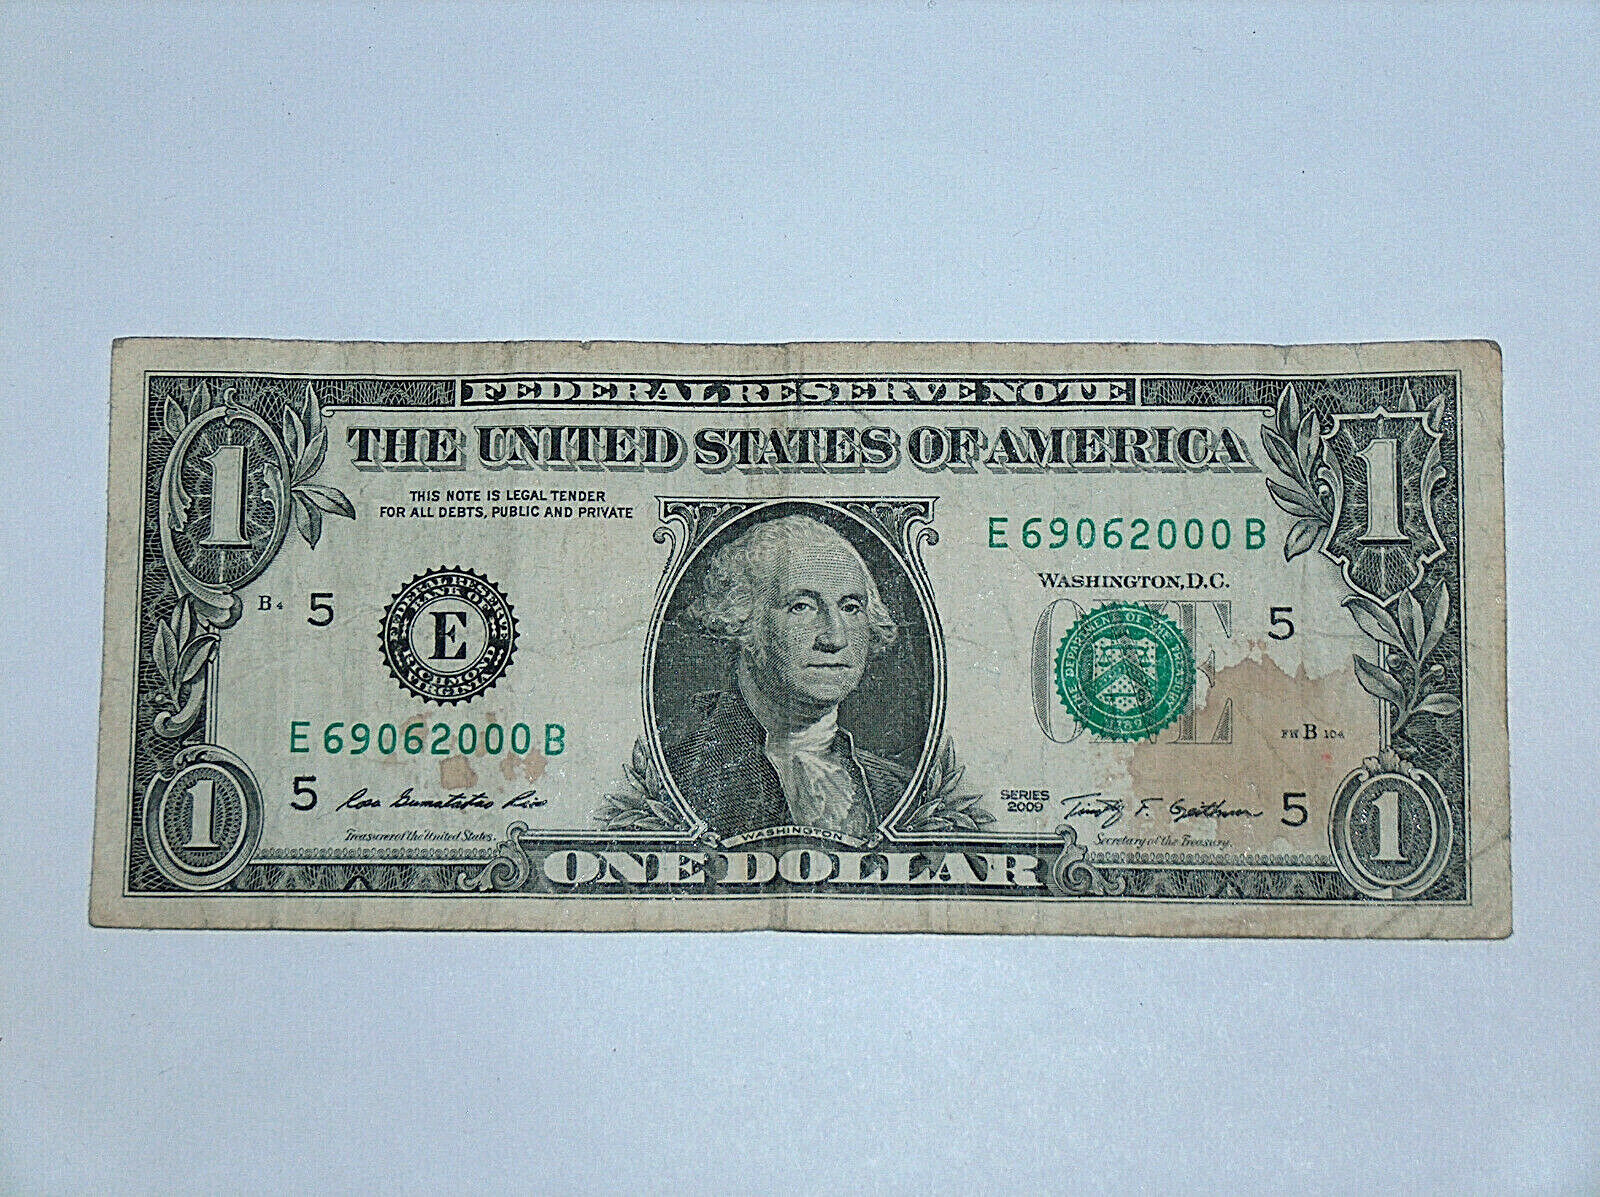 2009 $1 Bill US Bank Note Rhône-Alpes France Postal Code 69062 000 Fancy Serial#